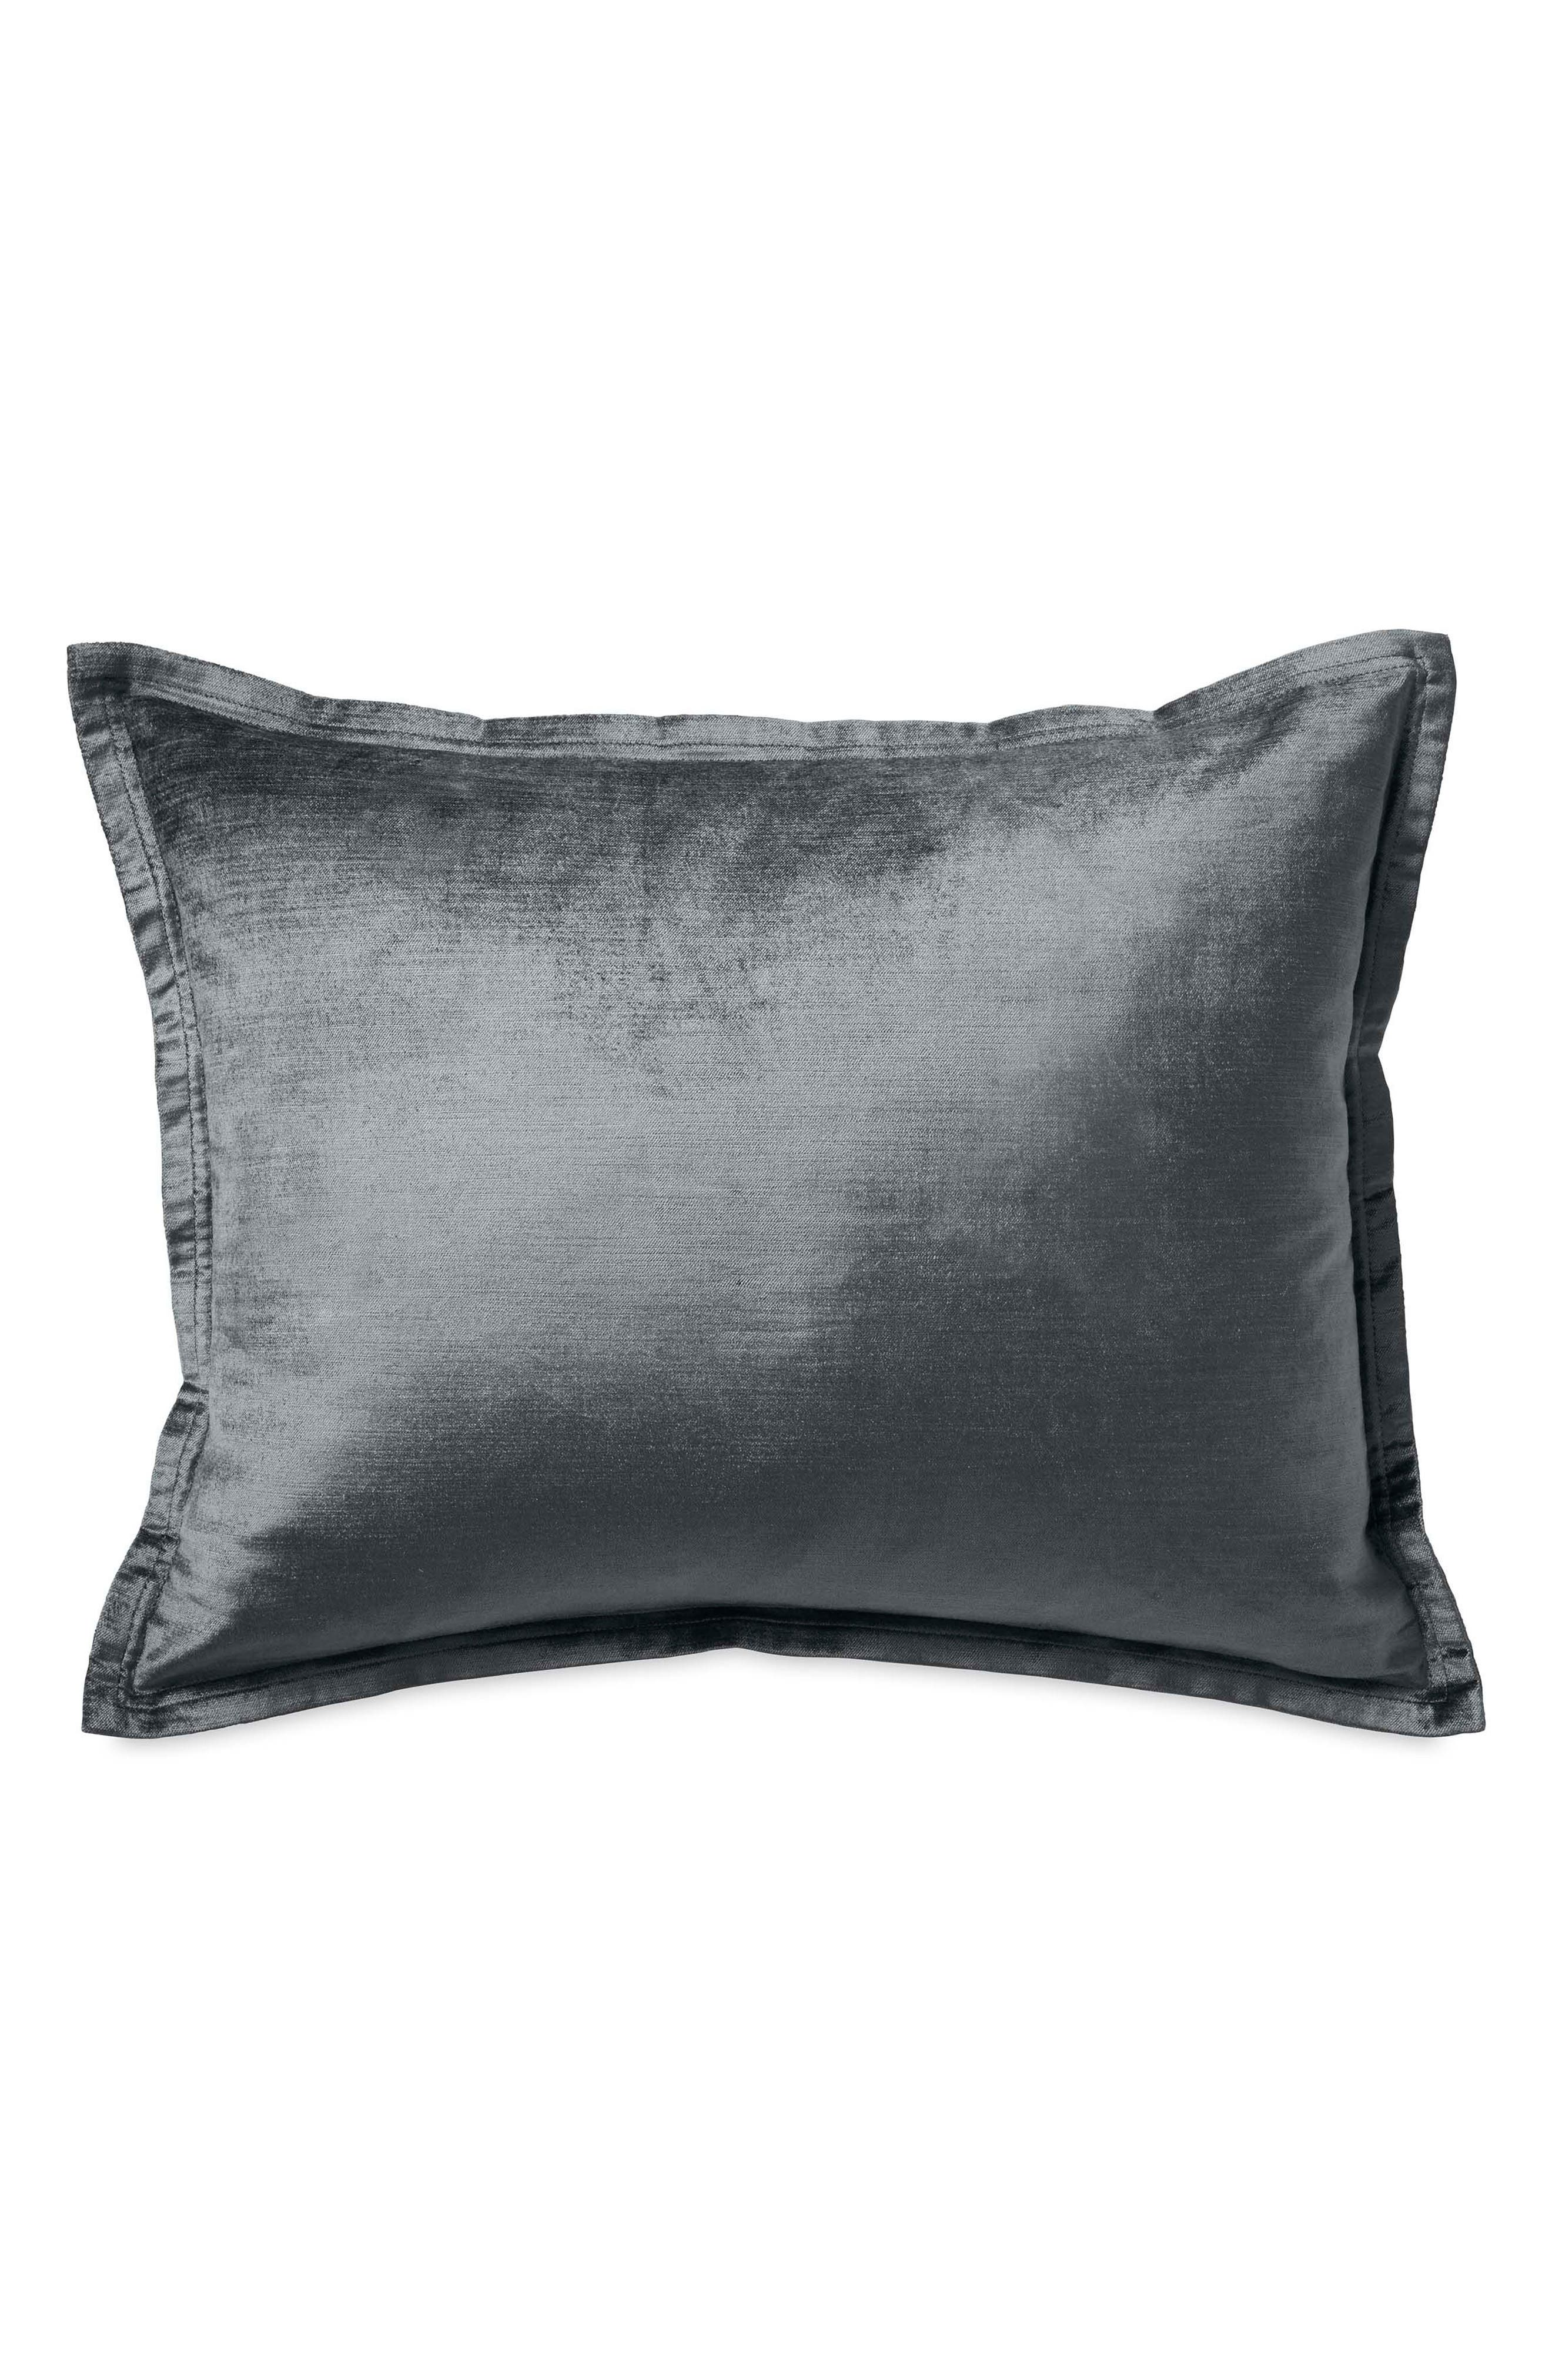 Alternate Image 1 Selected - Donna Karan New York Exhale Pillow